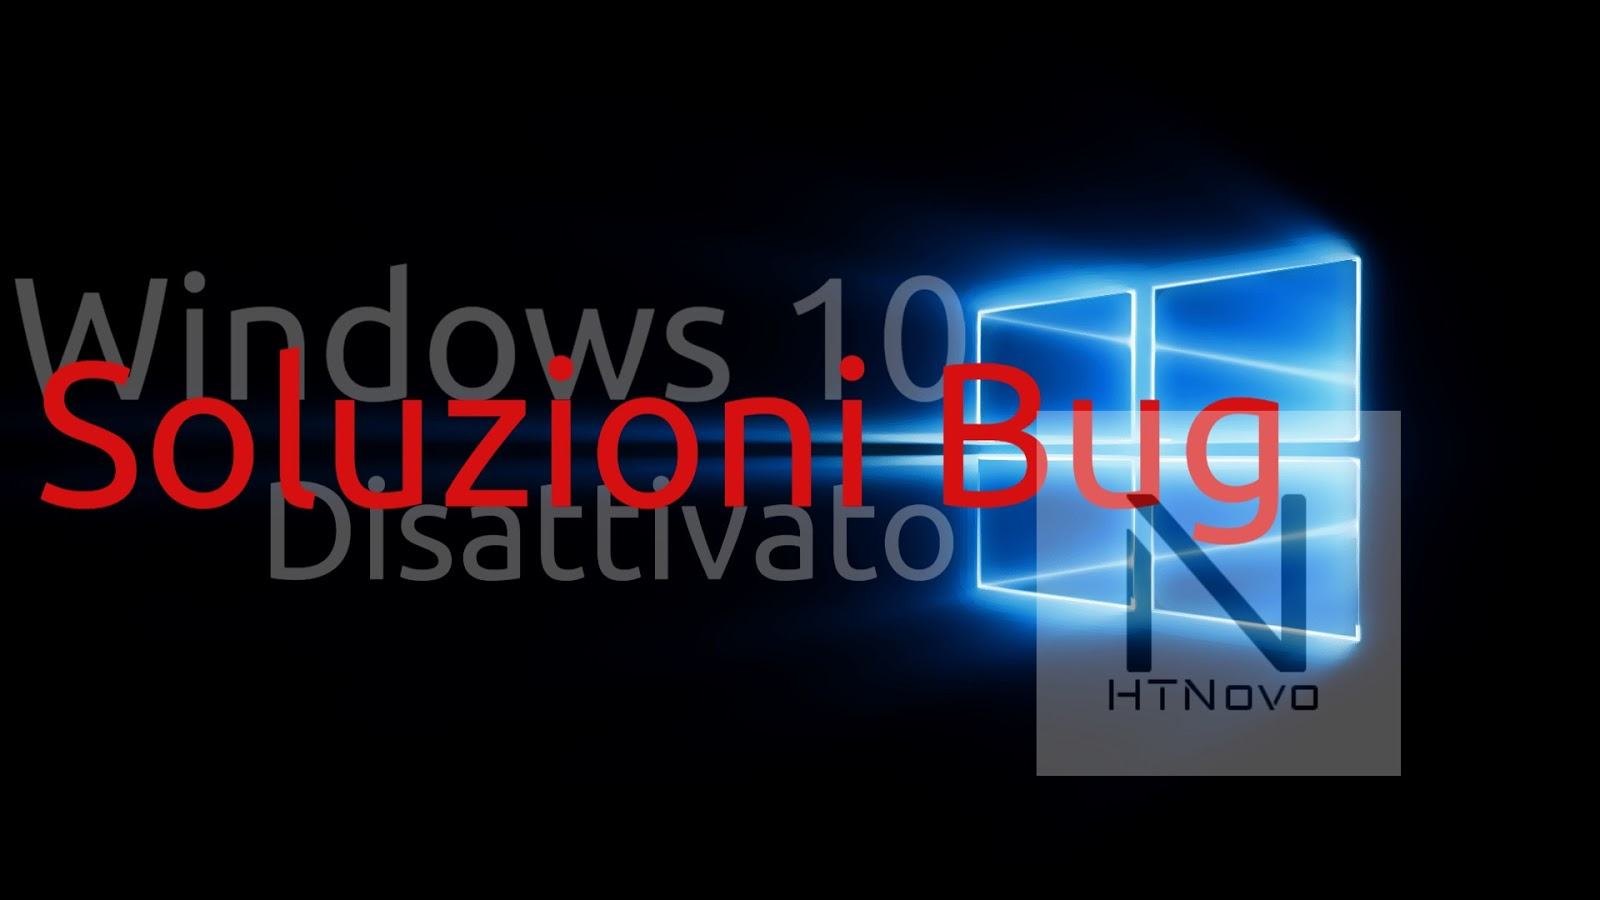 Windows-10-Pro-disattivato